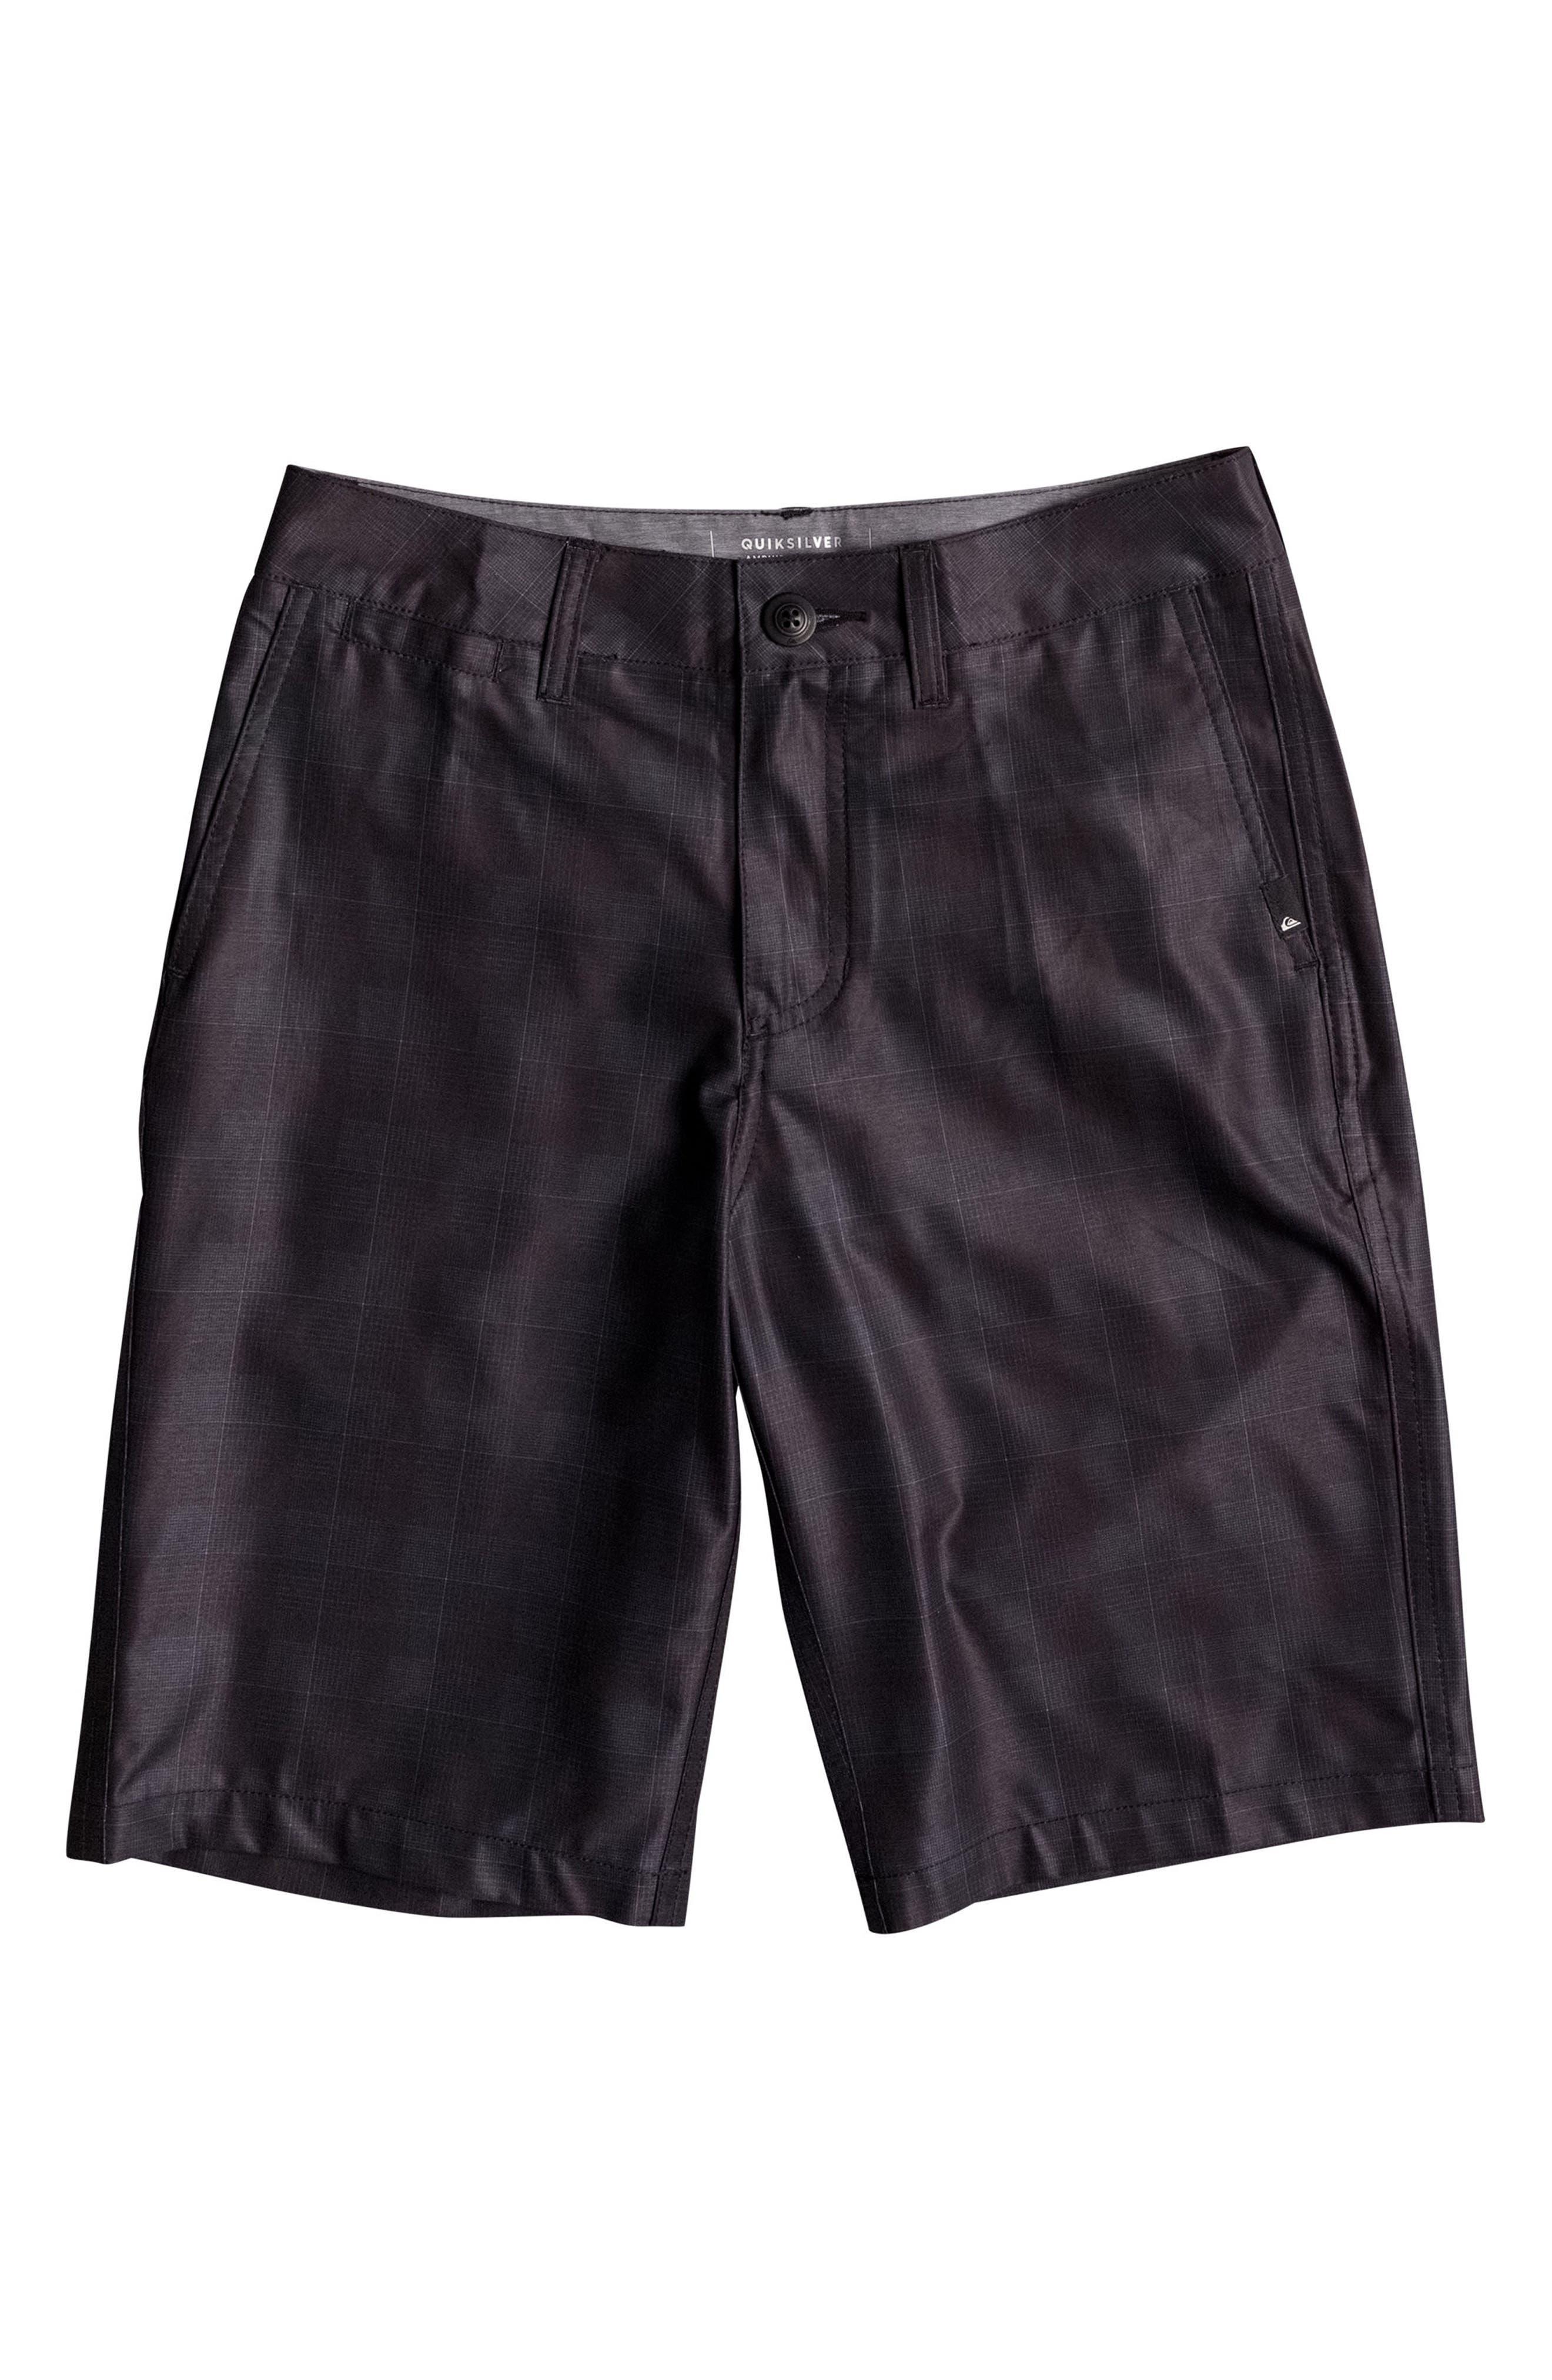 Main Image - Quiksilver Union Plaid Amphibian Hybrid Shorts (Big Boys)